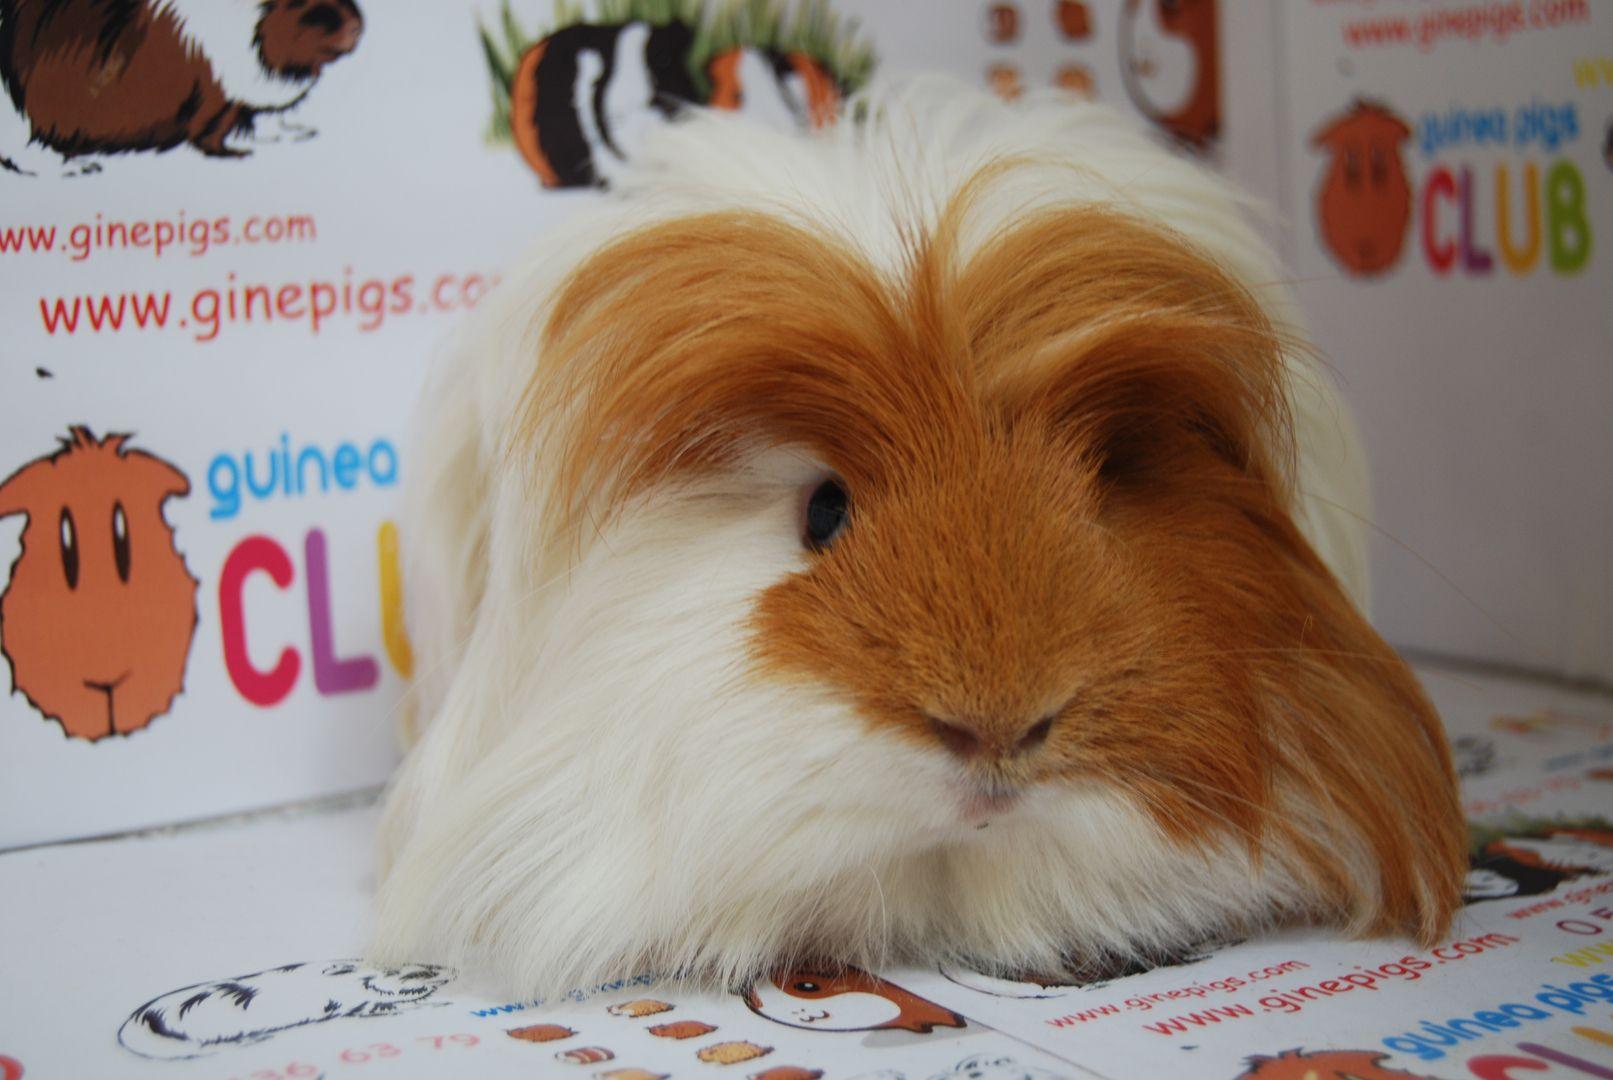 hight resolution of guinea pig sahiplenme ginepig sahiplenme ginepig fiyat